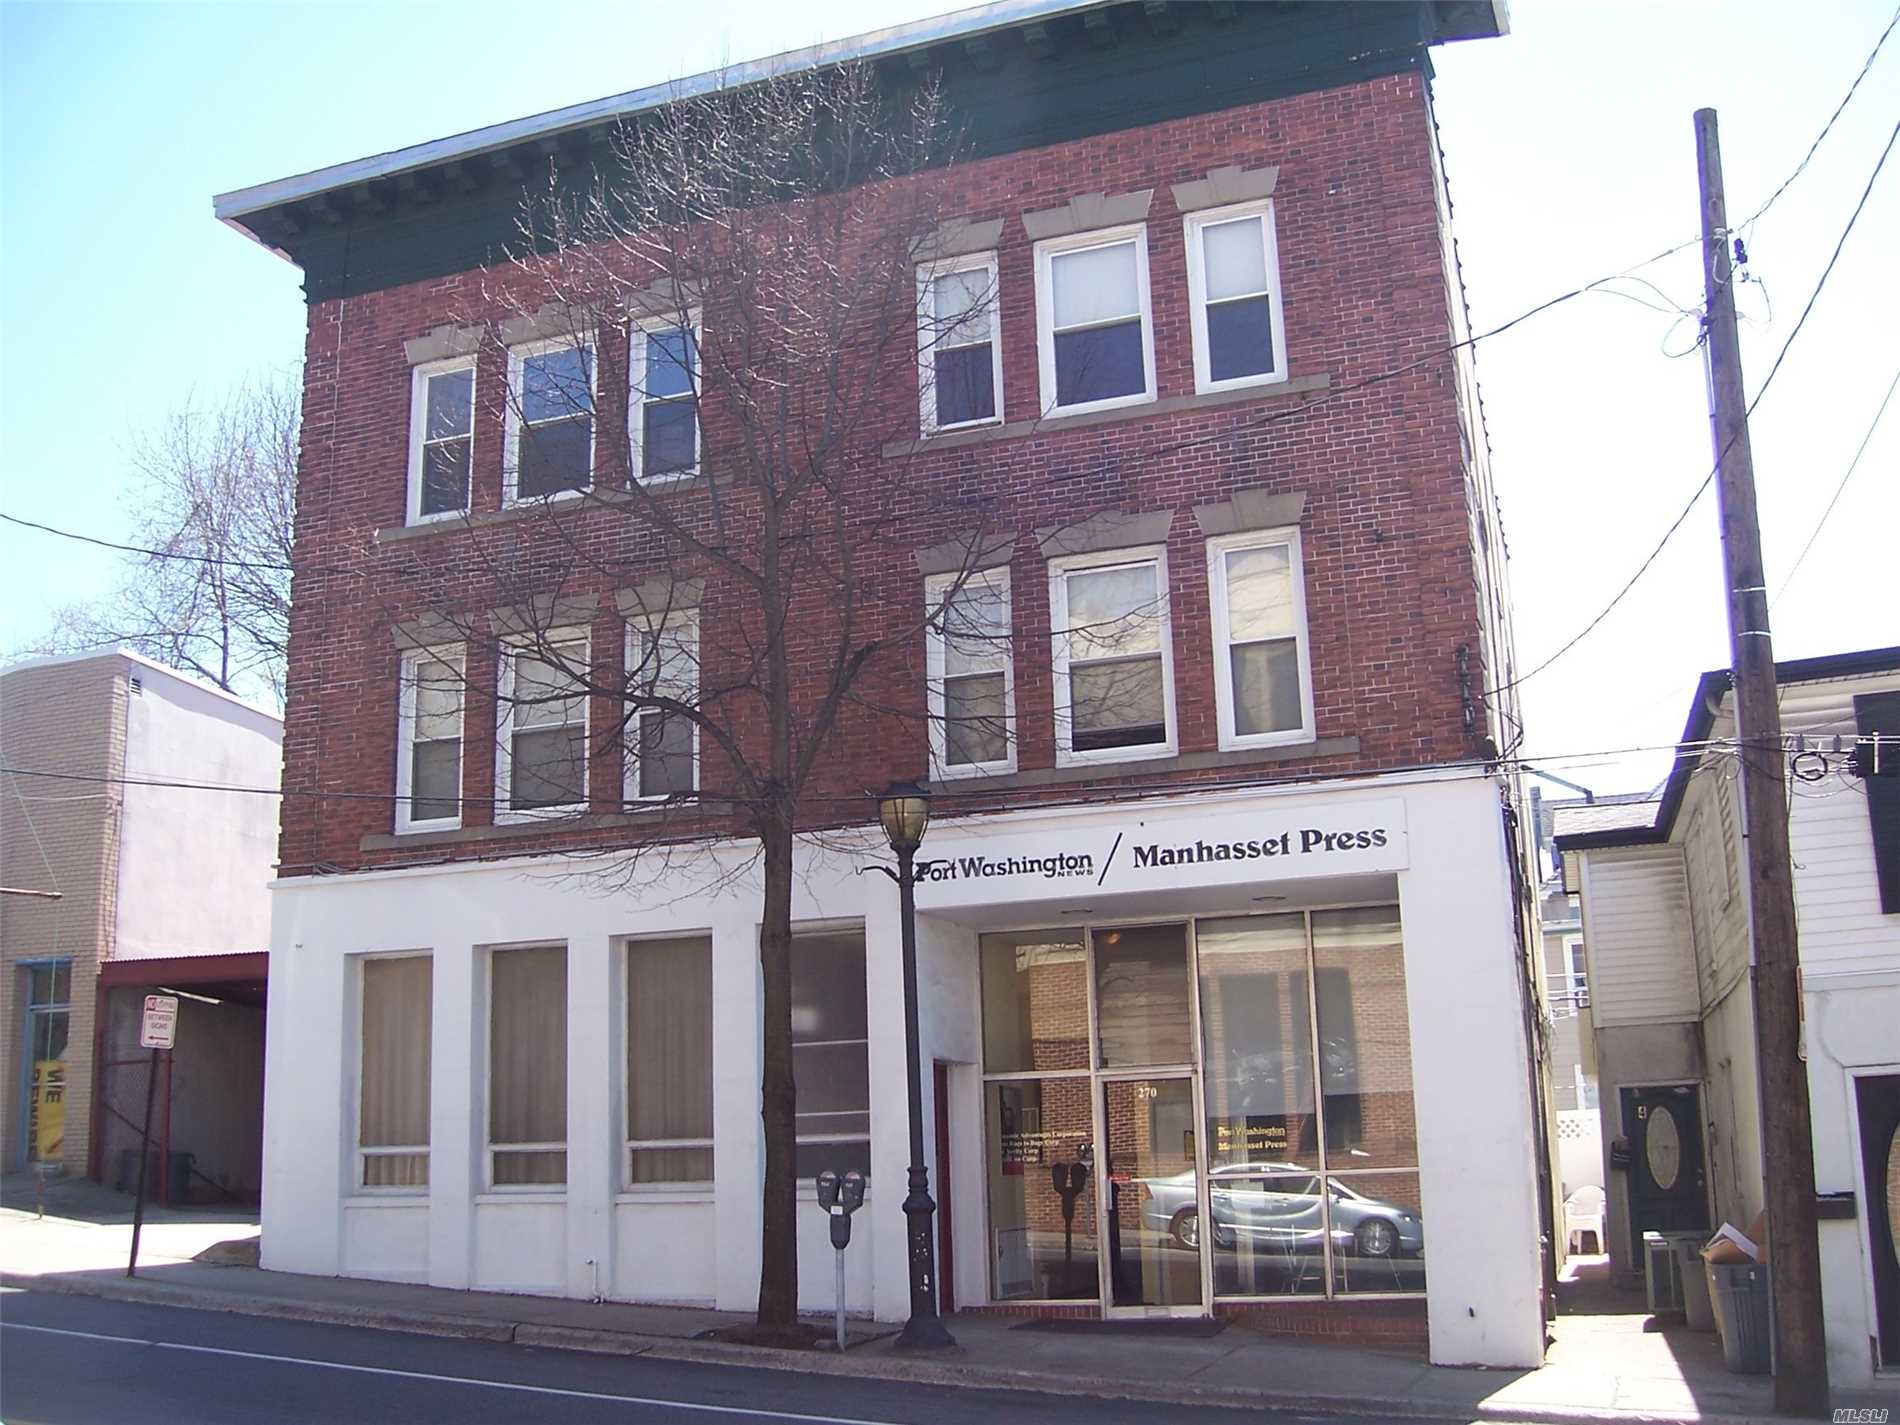 270 Main St - Port Washington, New York